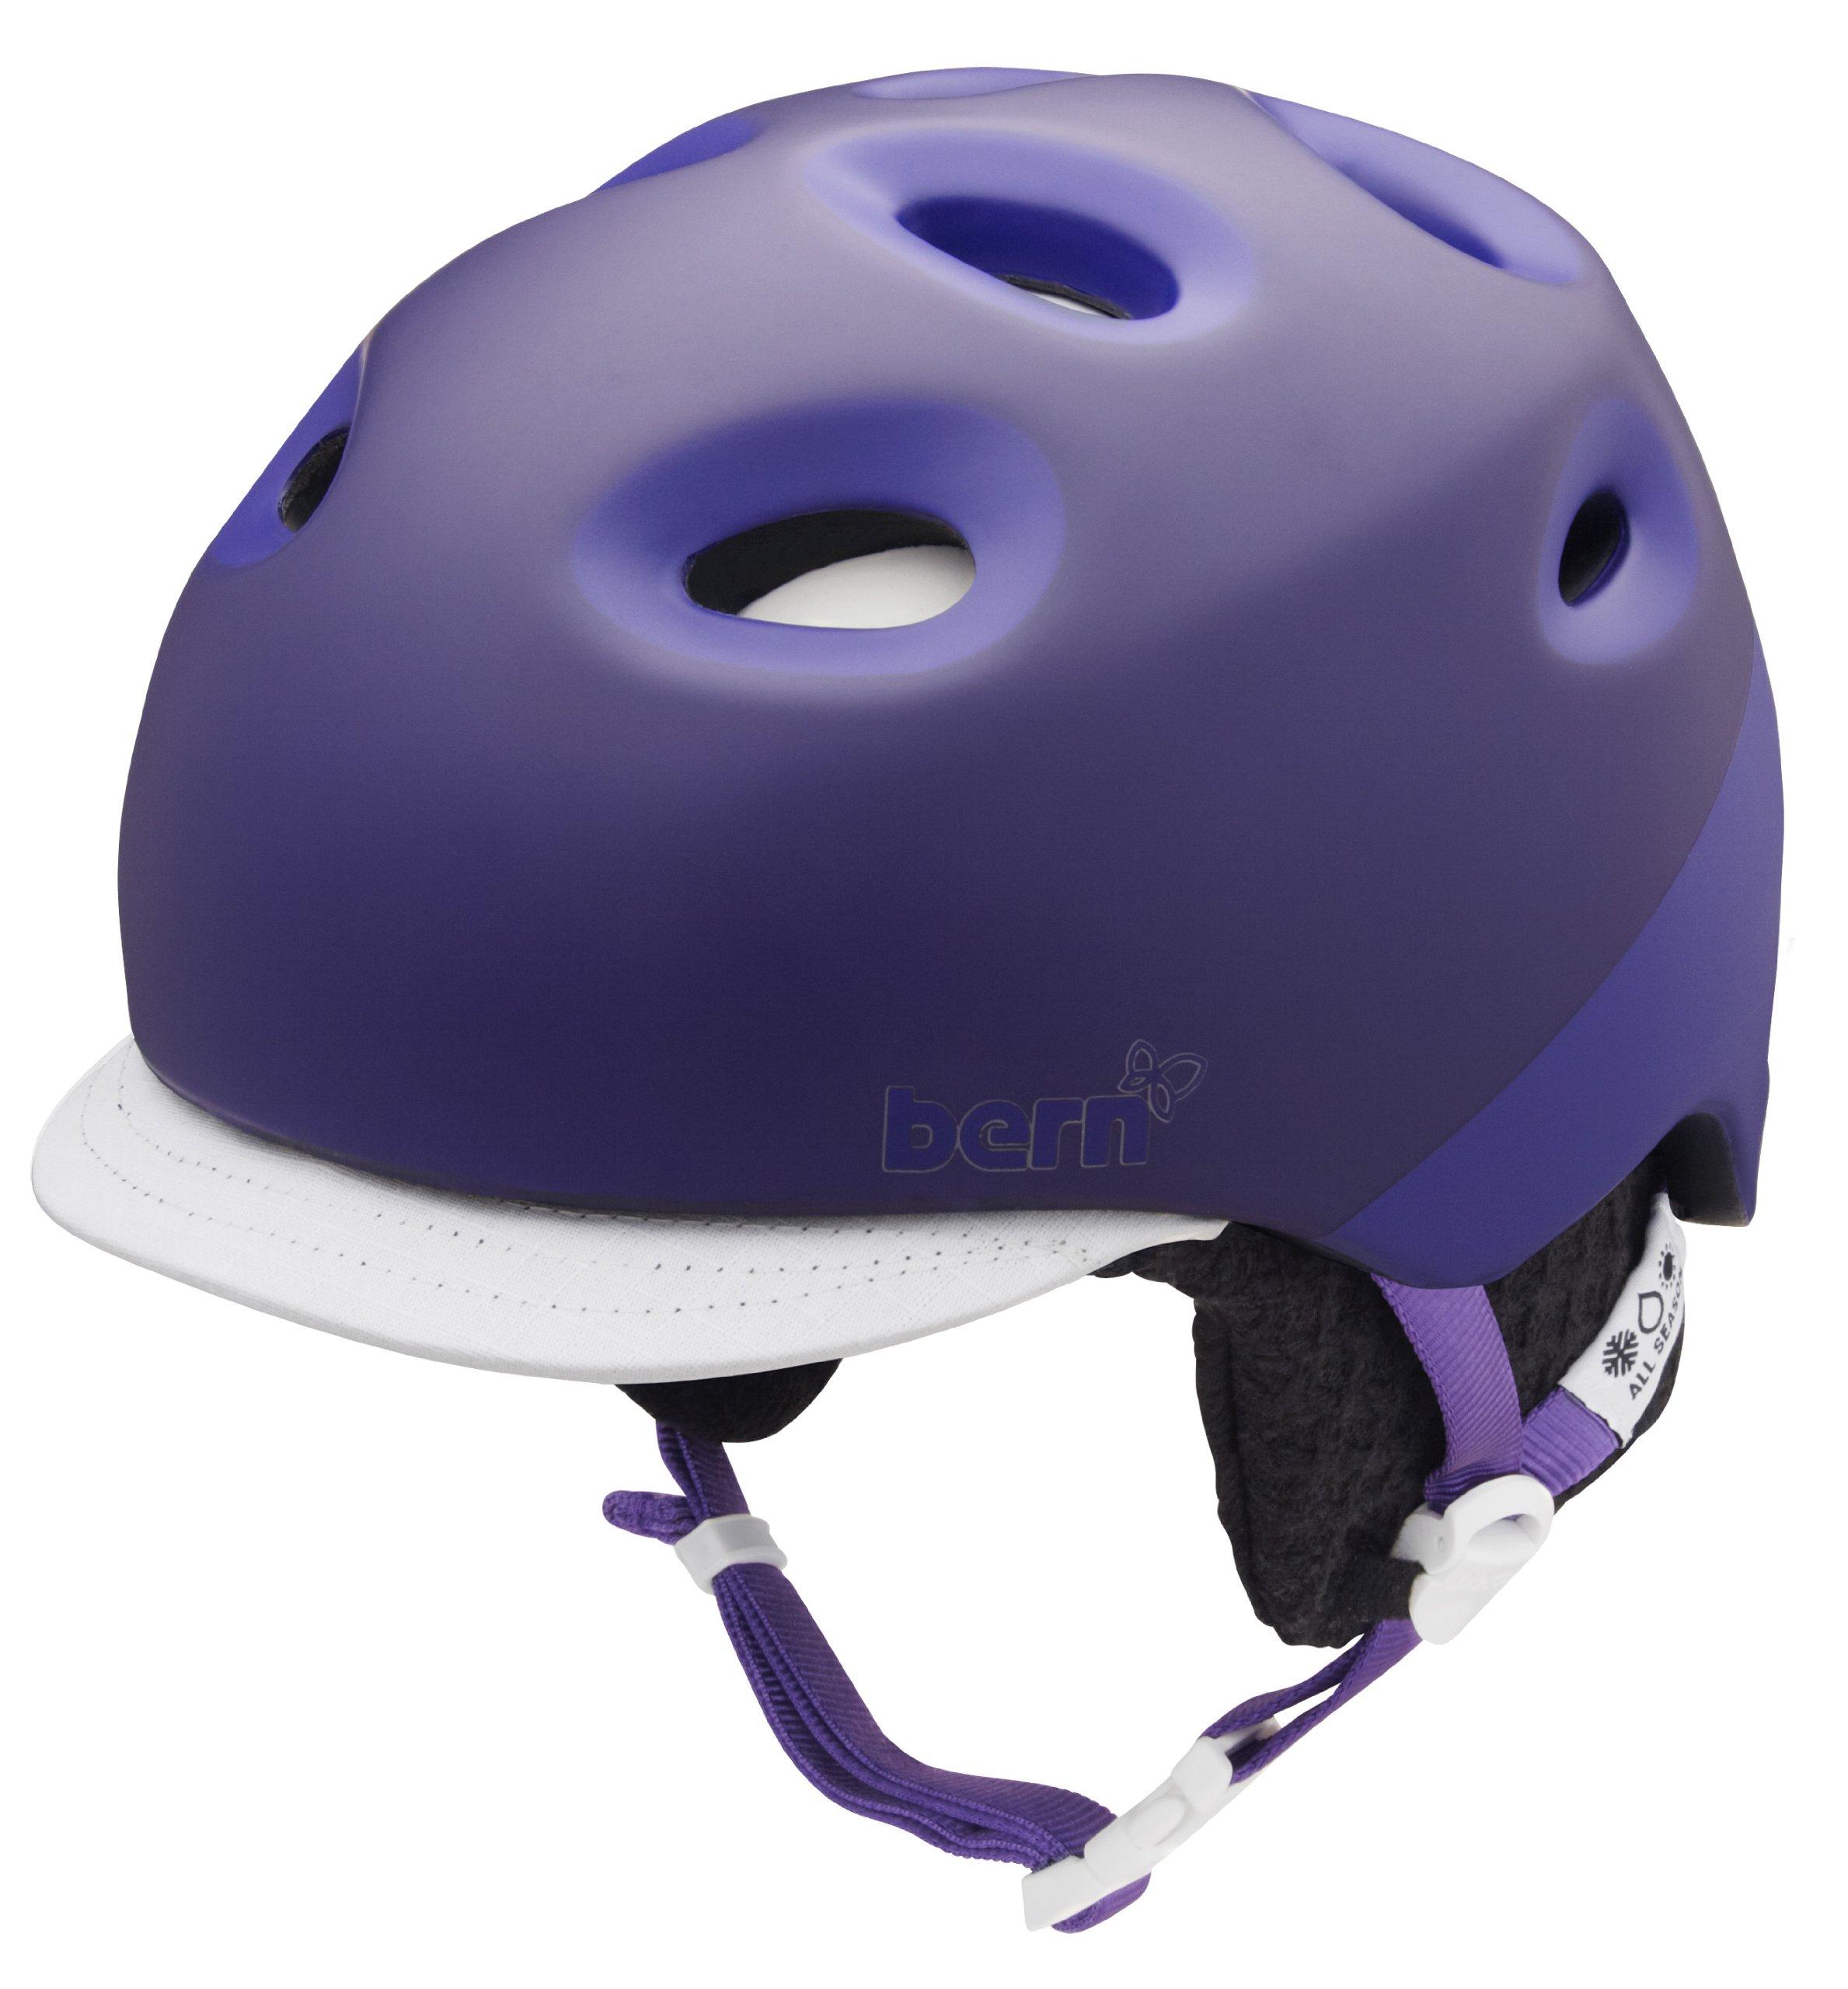 Bern Cougar 2 Tone Matte Helmet with Grey Knit (Purple, X-Small/Small)